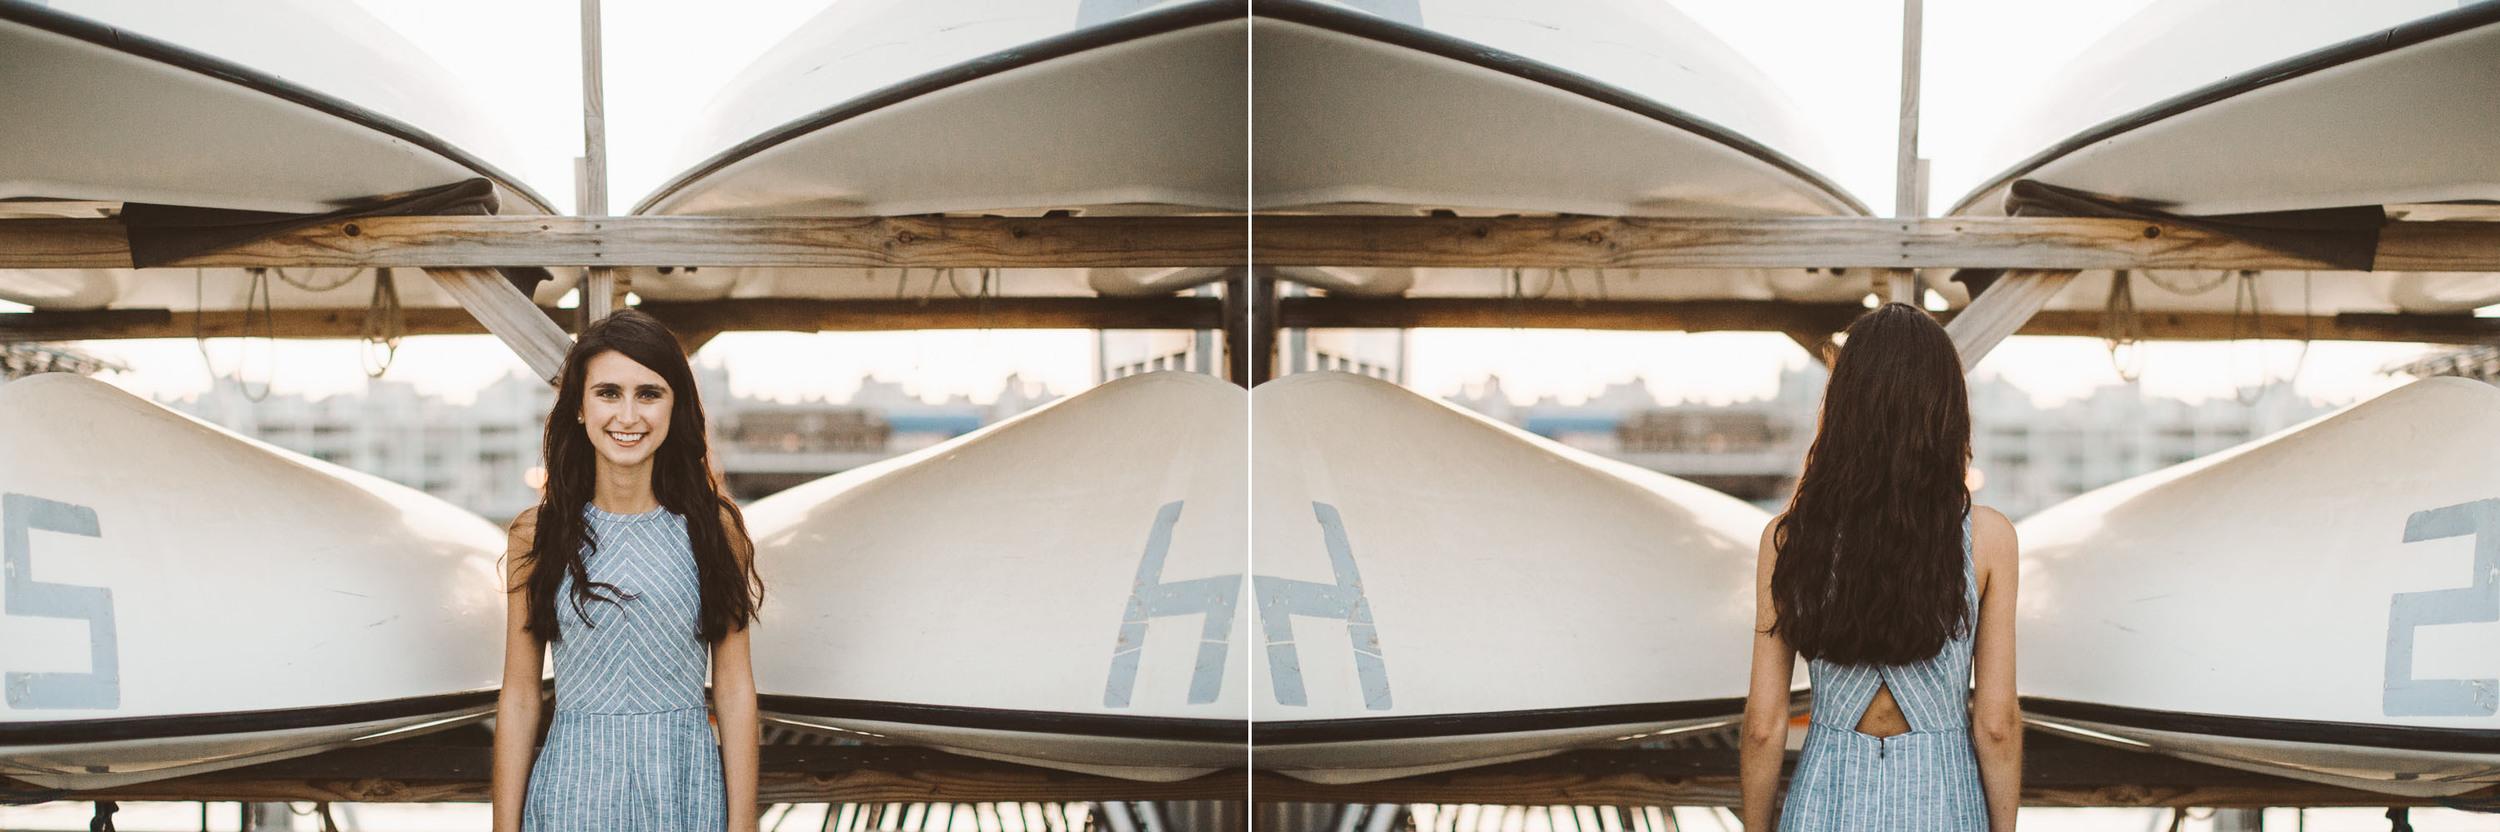 boston-harbor-sunrise-ethereal-portrait-photographer-11 copy.jpg